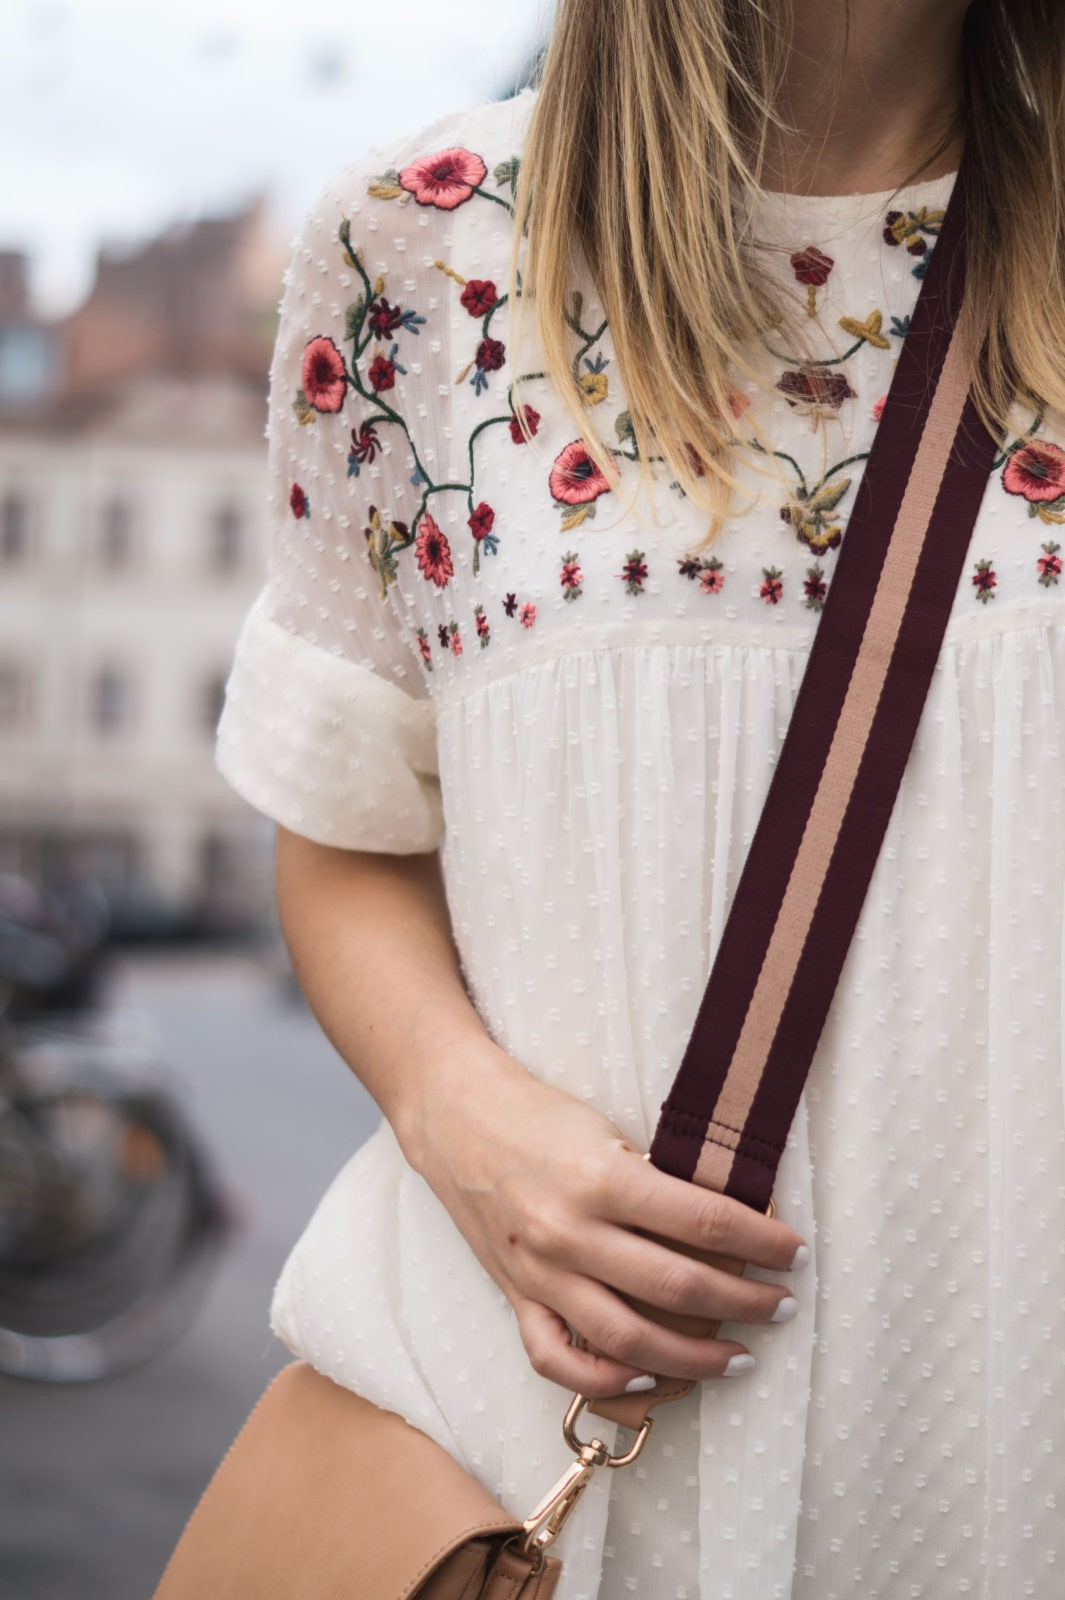 Floral Summer Dress Zara Jumpsuit Black Loafers Pantoletten Sommerkleid Streetstyle Heidelberg Sariety Modeblog Details